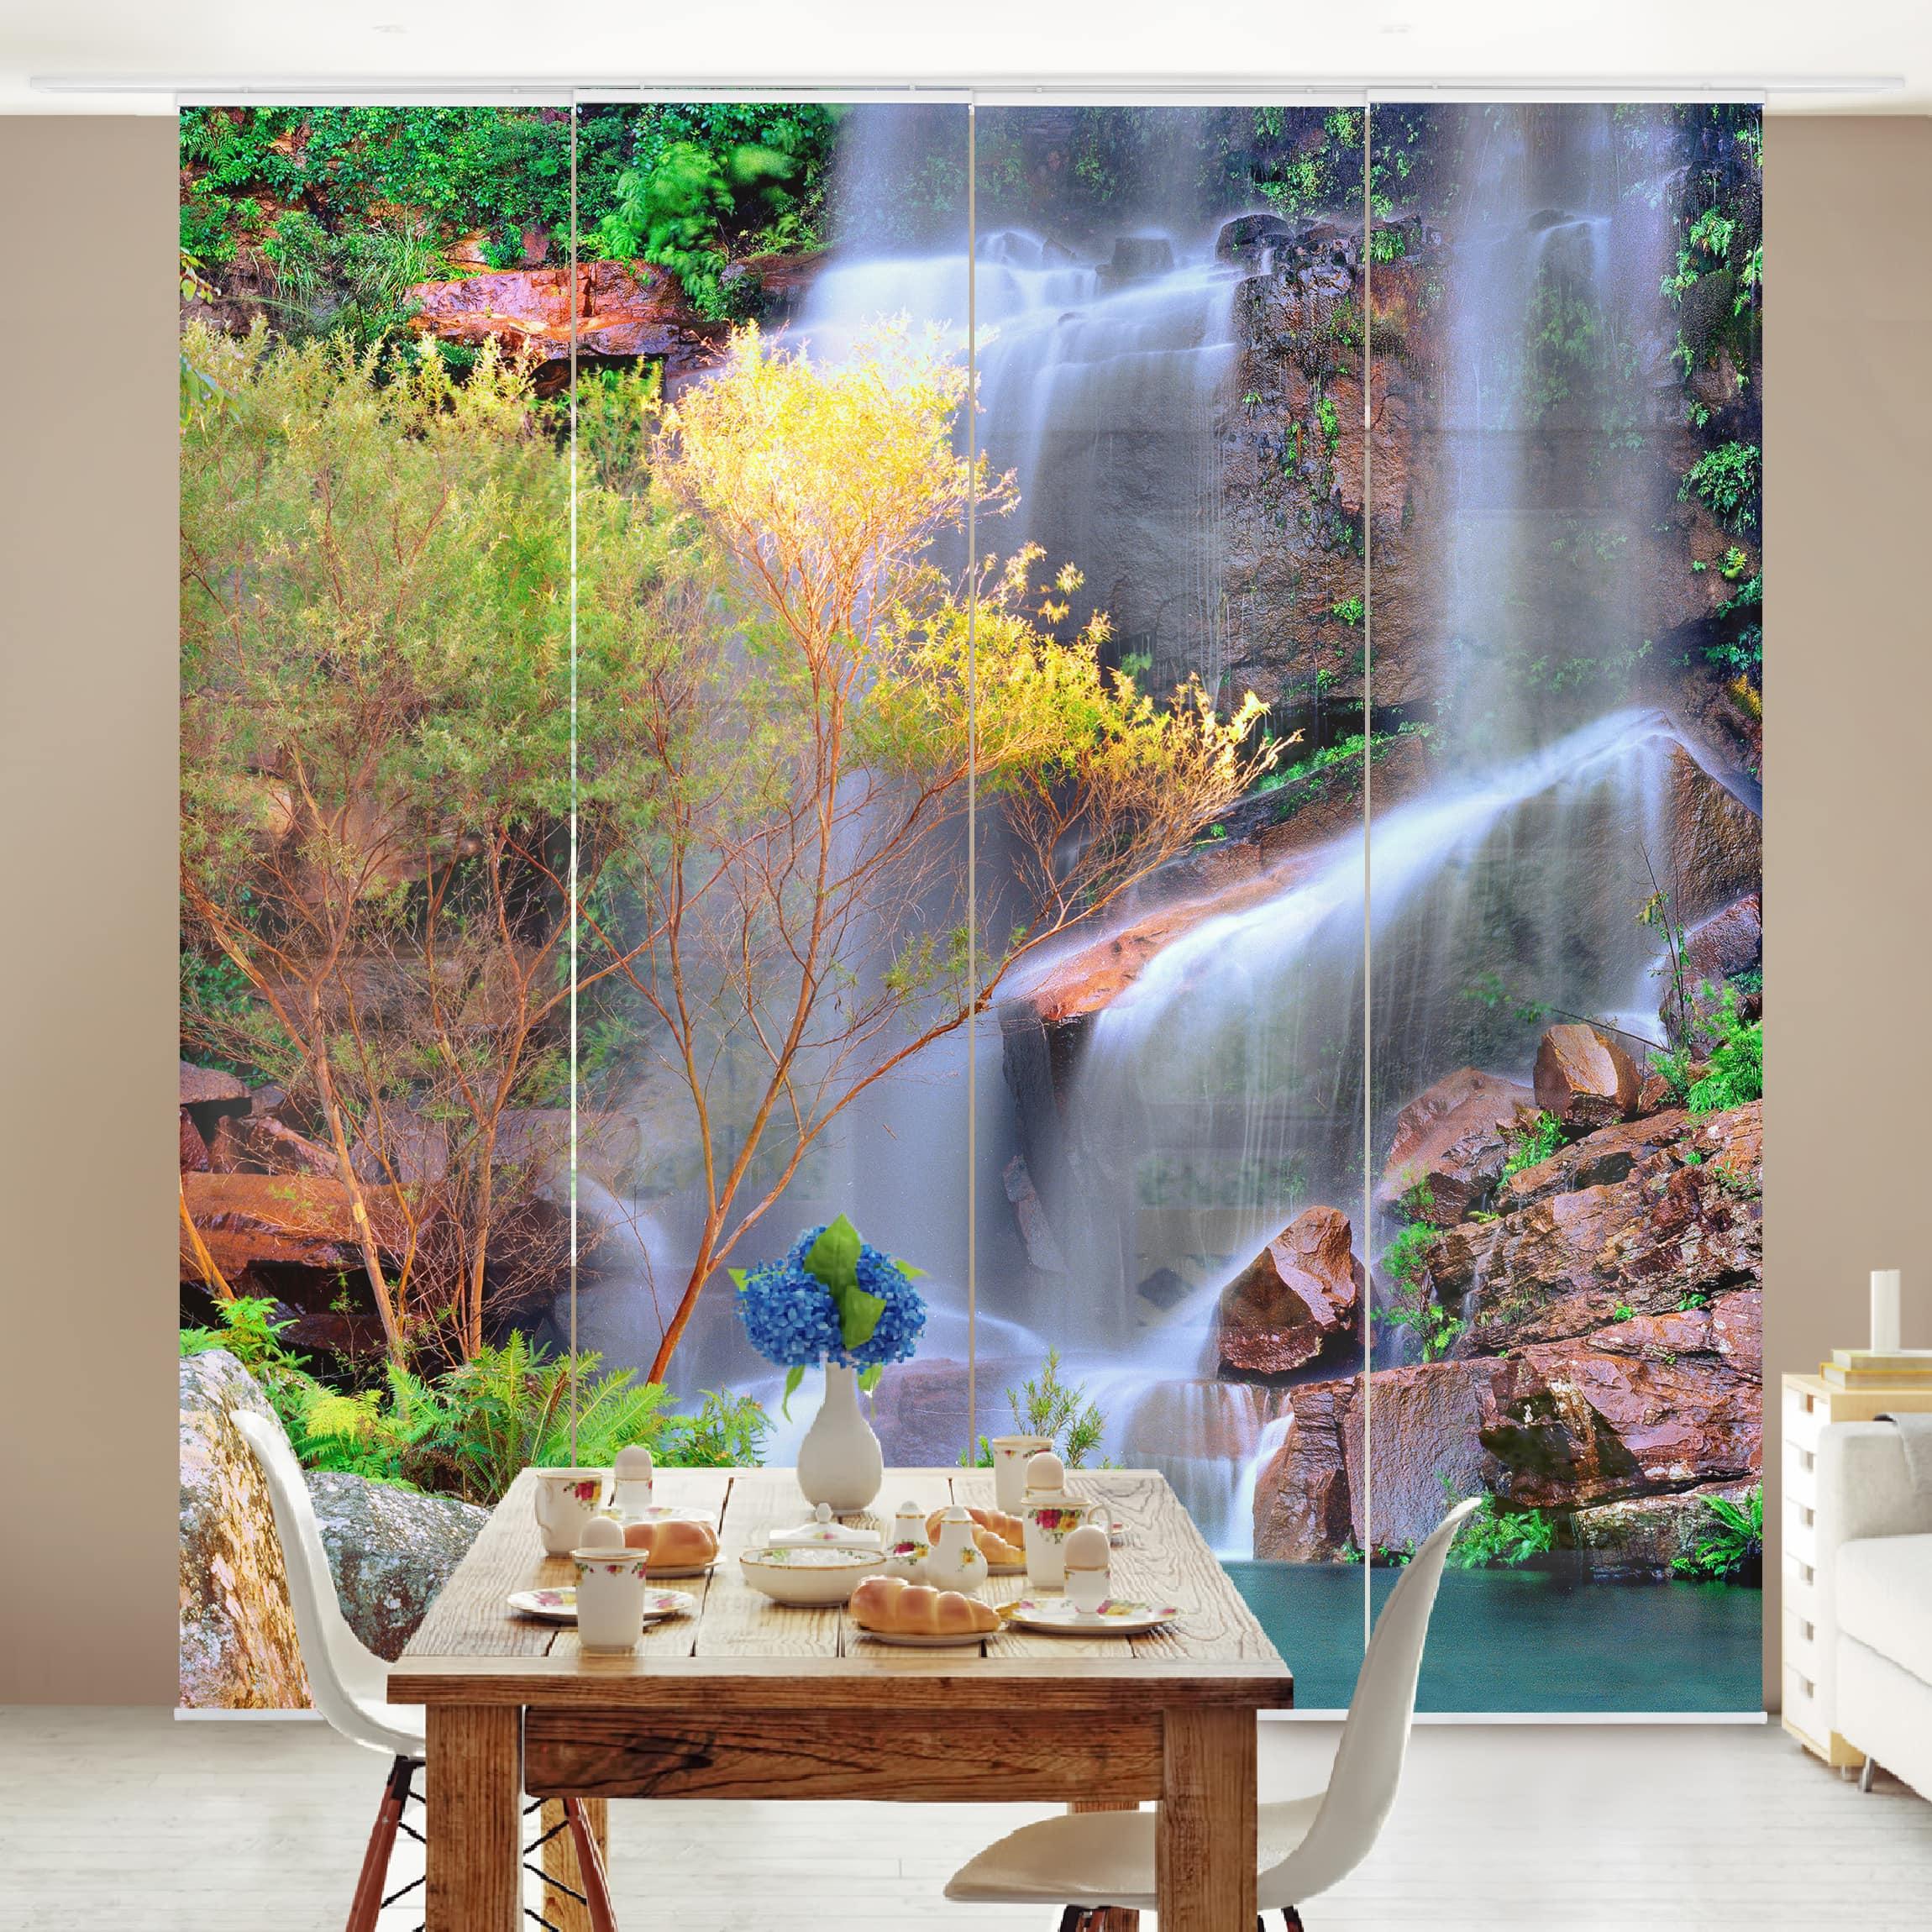 schiebegardinen set summer fairytale 4 fl chenvorh nge. Black Bedroom Furniture Sets. Home Design Ideas